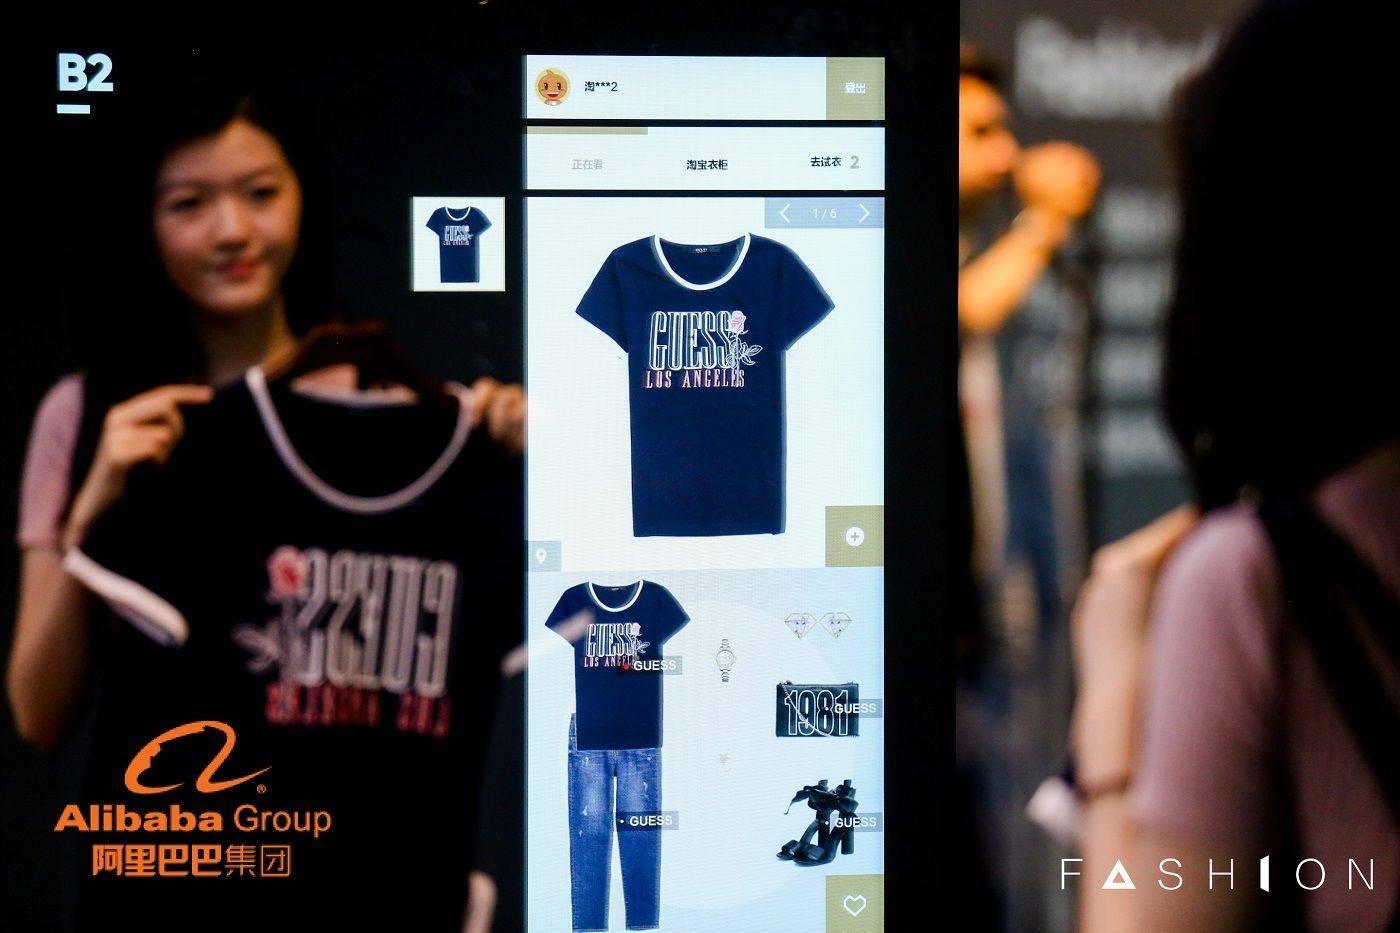 AI+Fashion是你想象中的未来服装店吗?